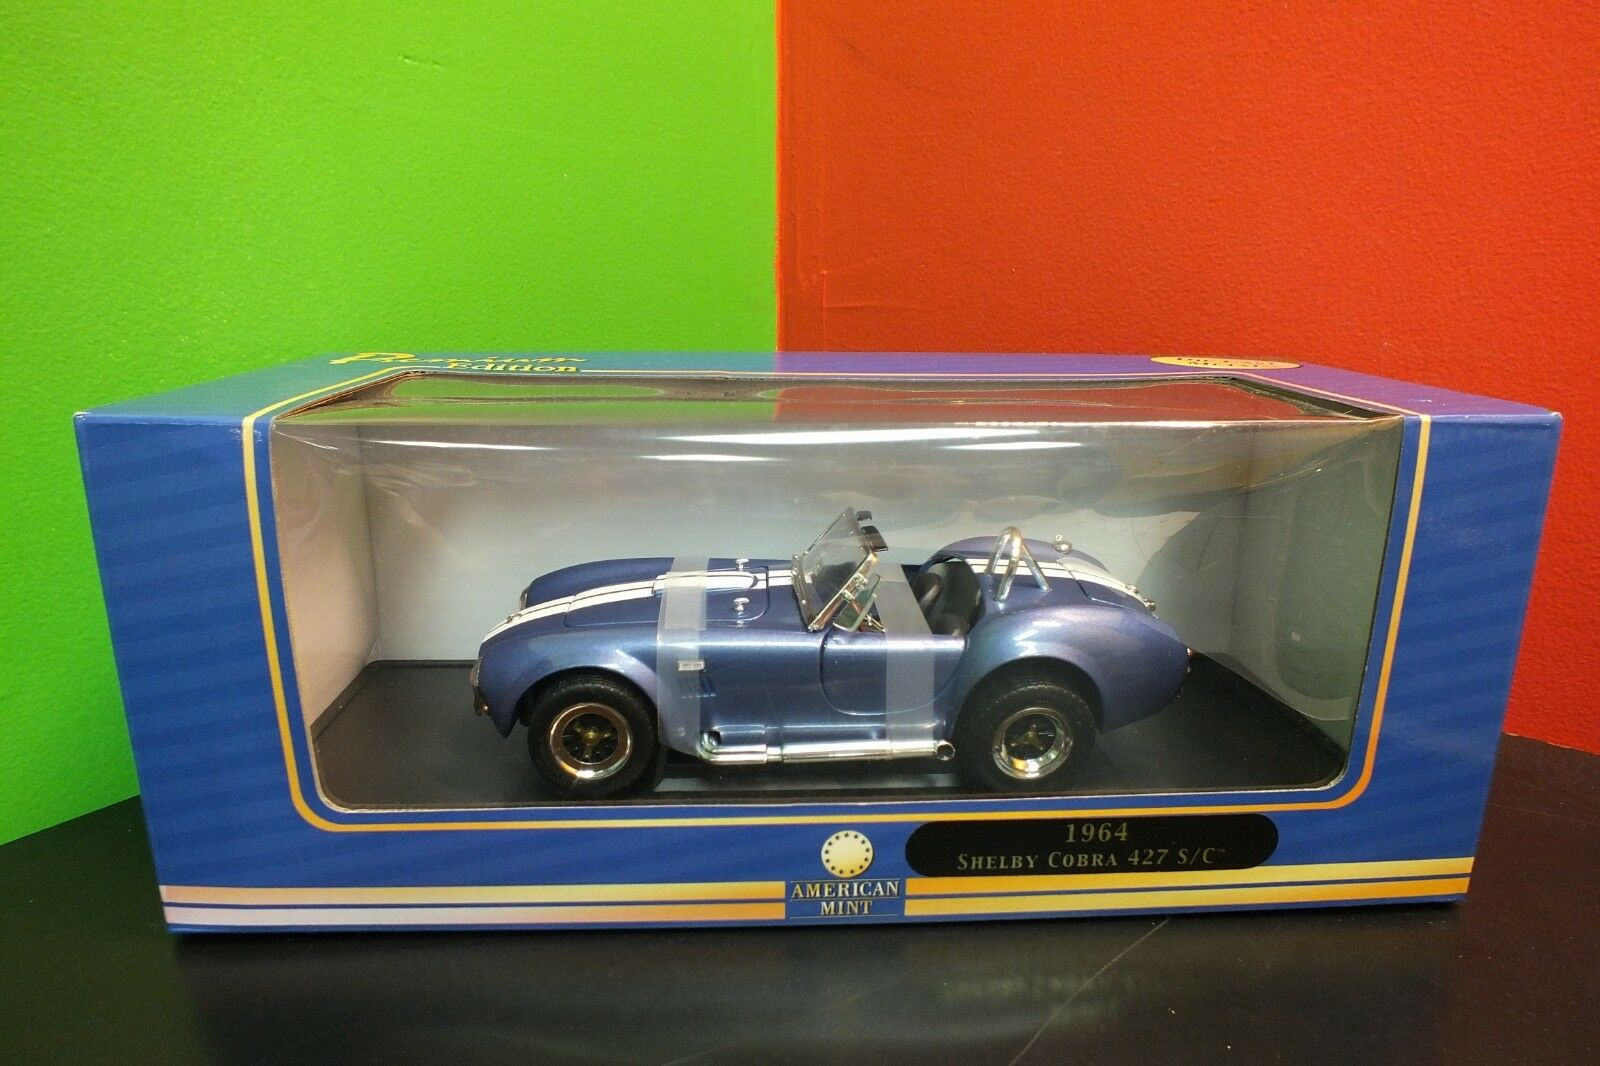 American Mint 1964 Shelby Cobra 427 S C 1 18 Diecast Car